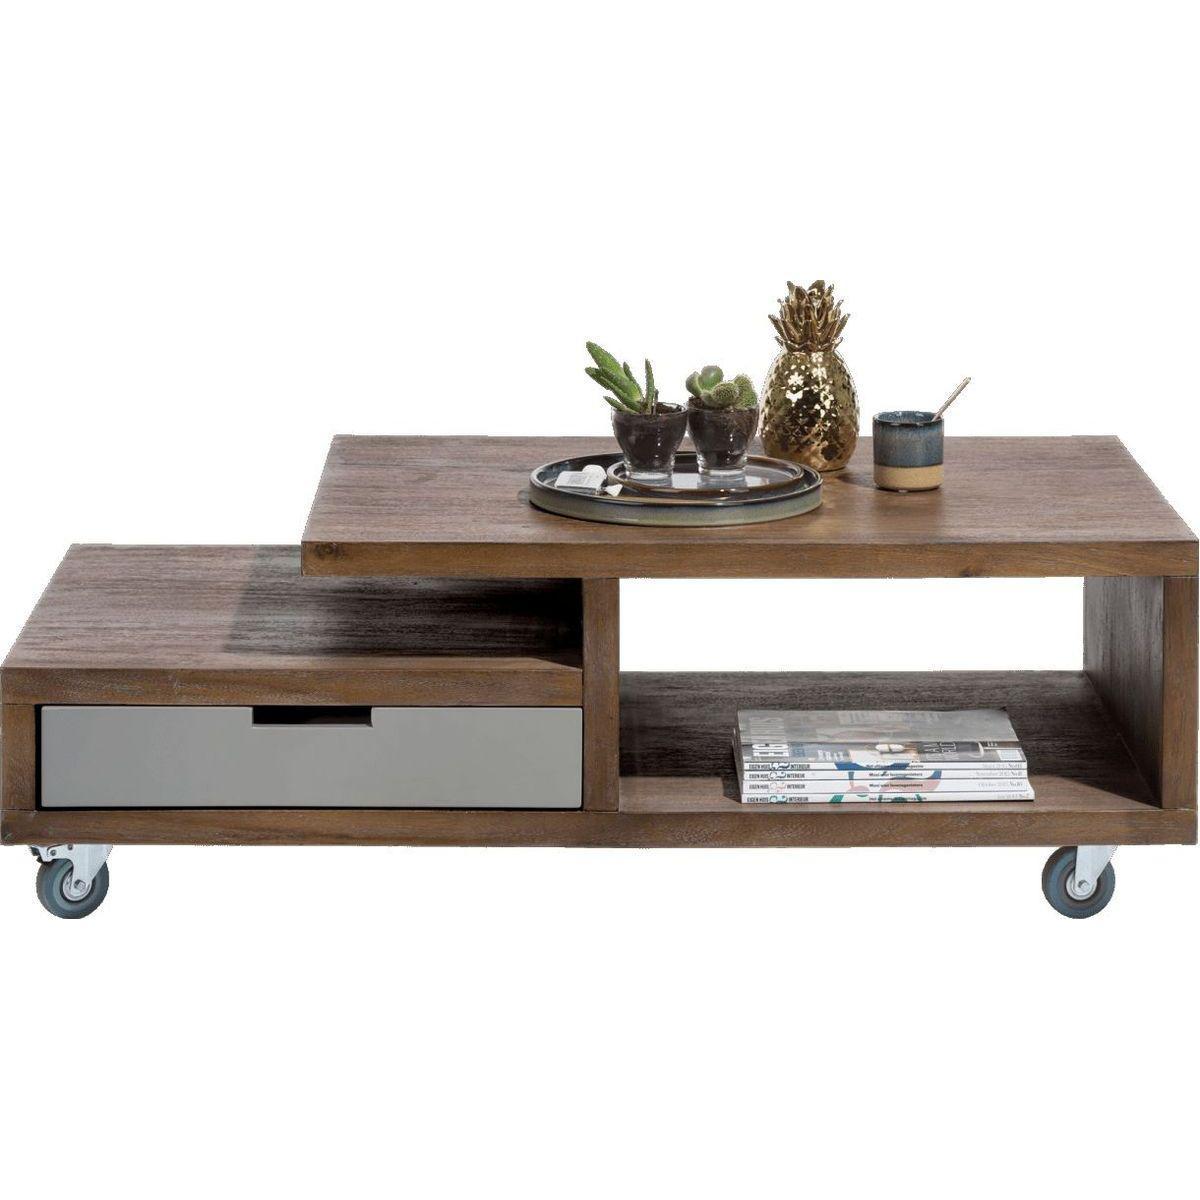 Living Basse Box 60x120cm Tramwood GrisAbitare Table Heth Walnut P08wknOX